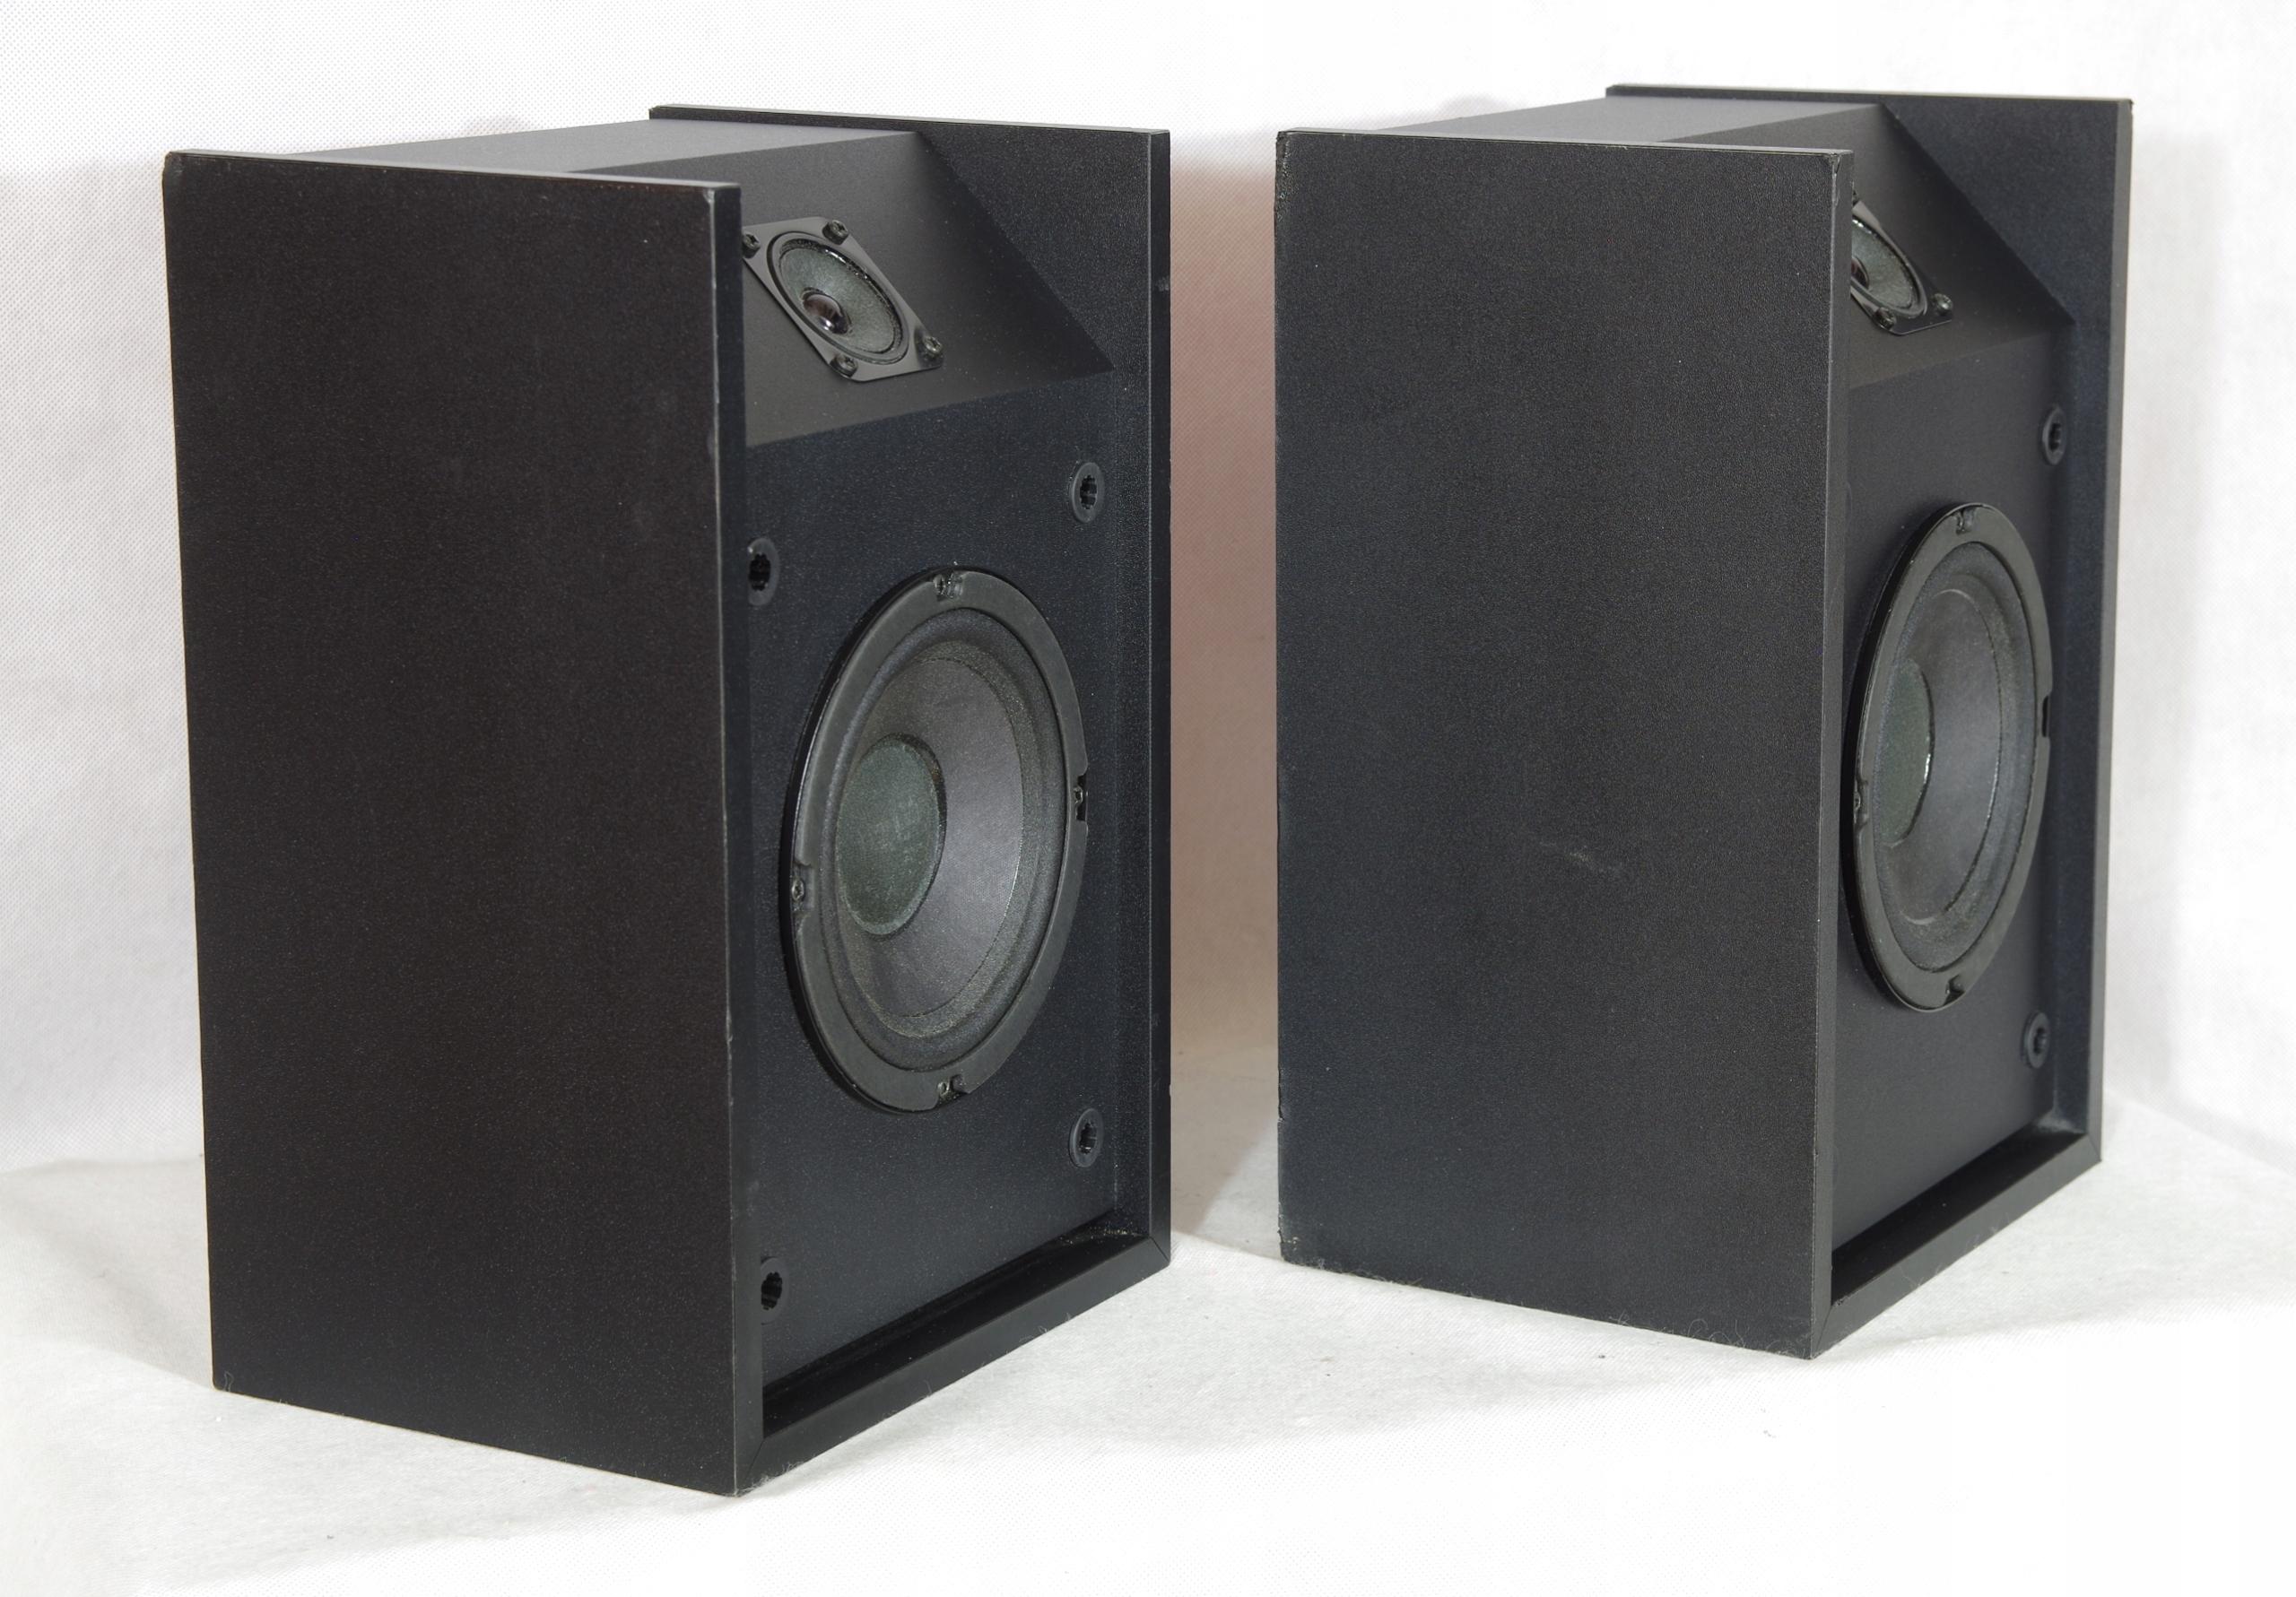 Bose 201 Series III, świetne monitory, kolumny ...